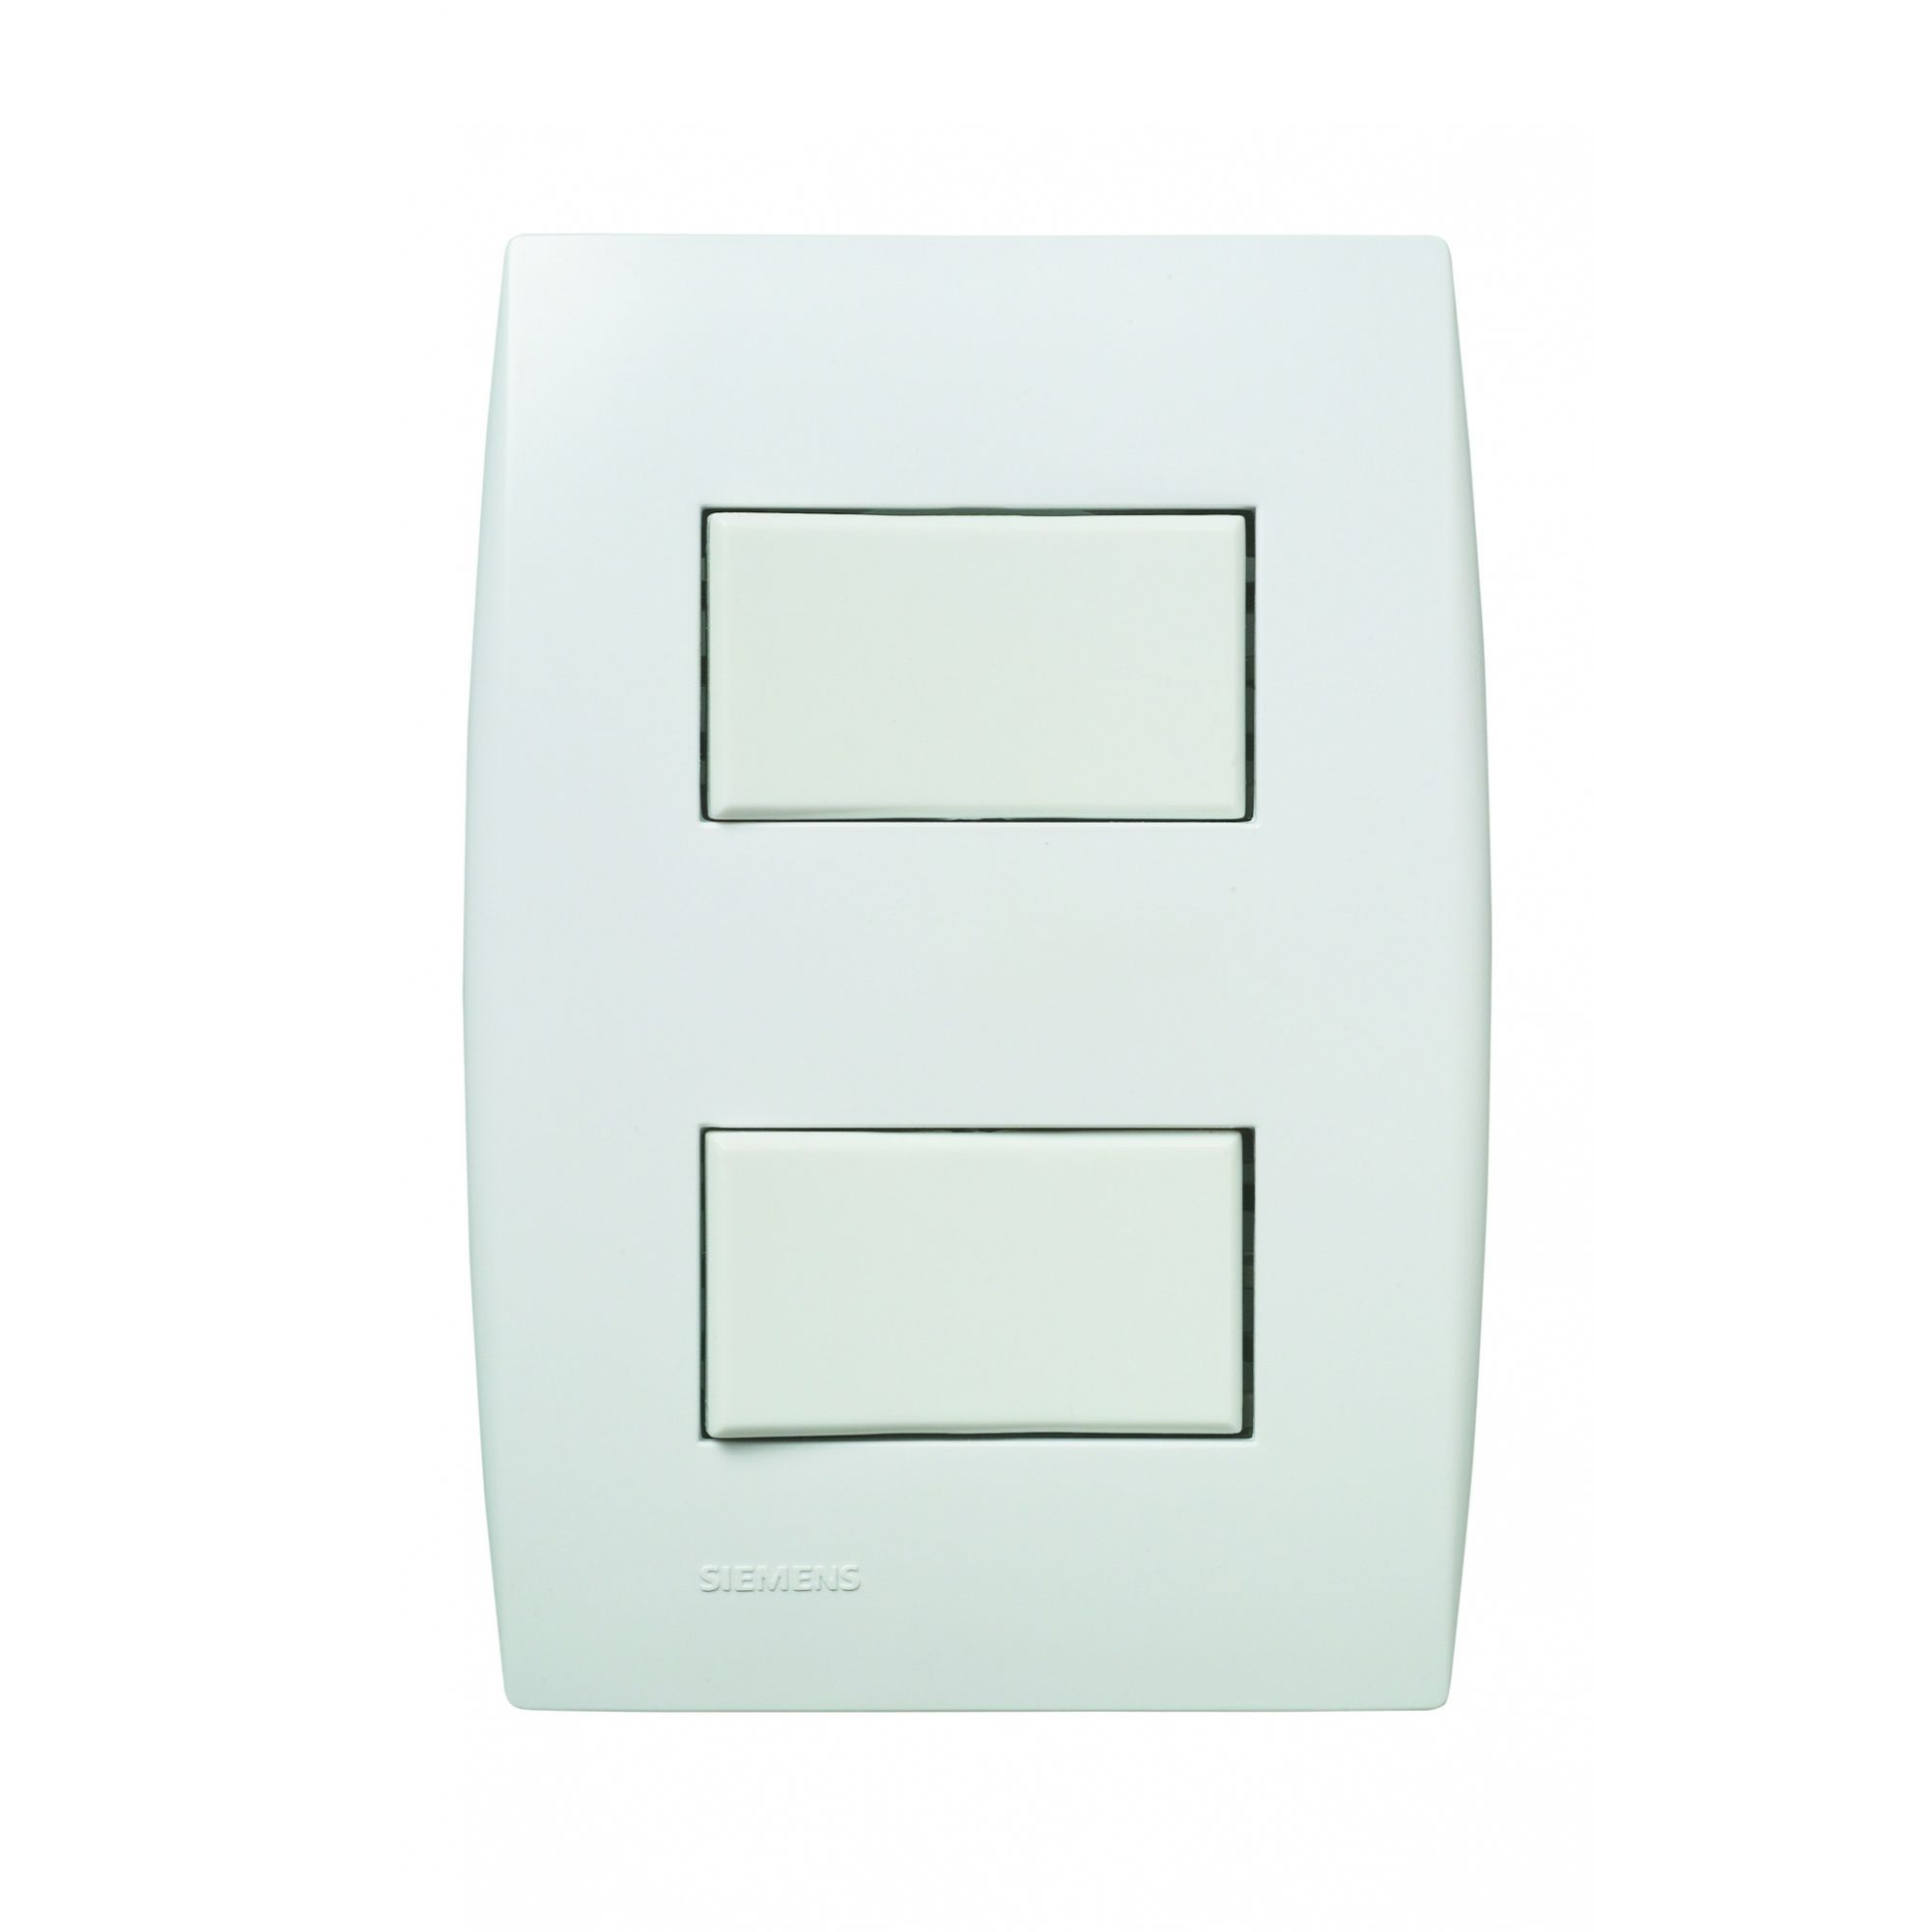 Interruptor Simples + 1 Interruptor Paralelo – Ilus 5TA9 9050 - Siemens